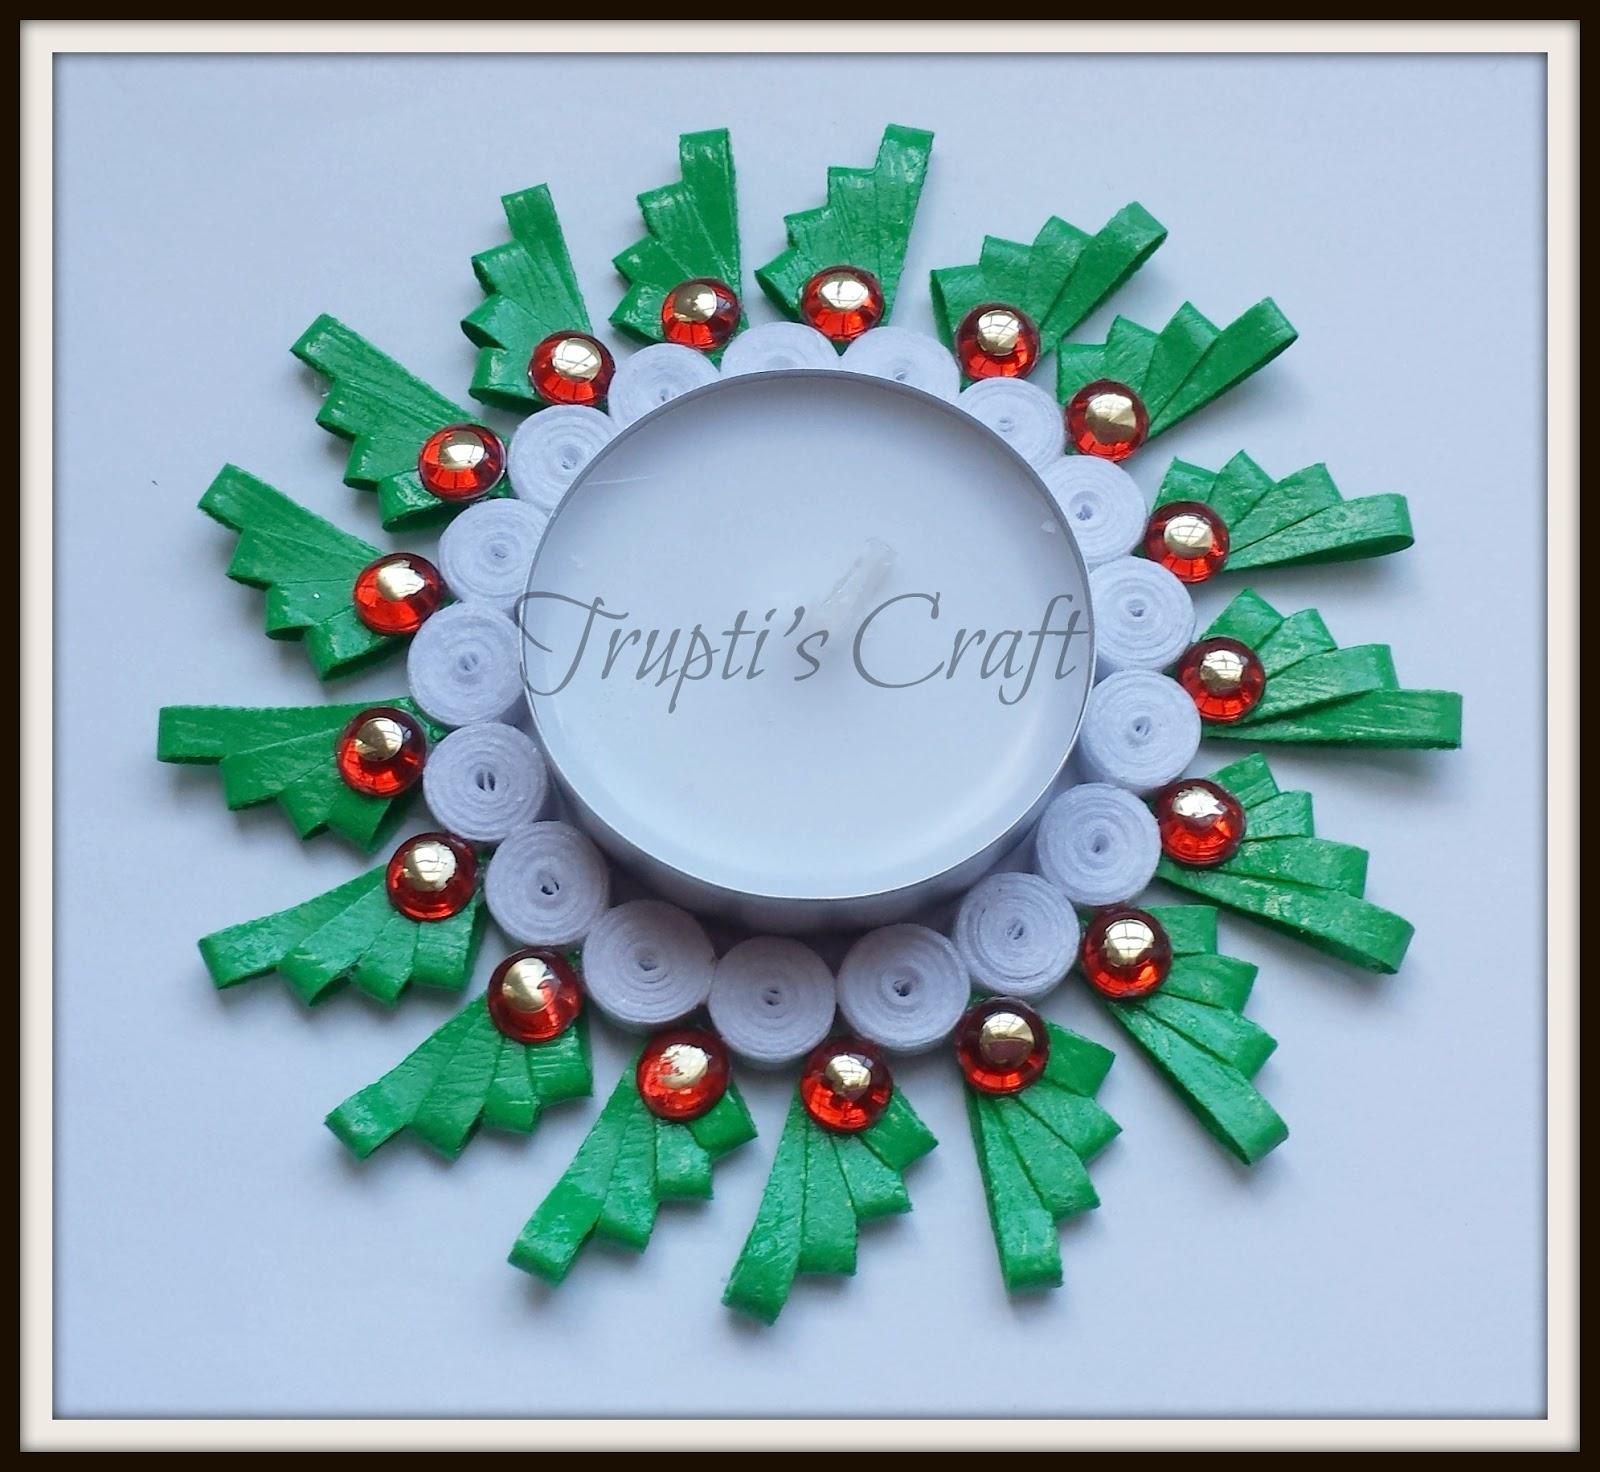 Trupti's Craft: Multipurpose Paper Quilling Candle Holder ... - photo#38